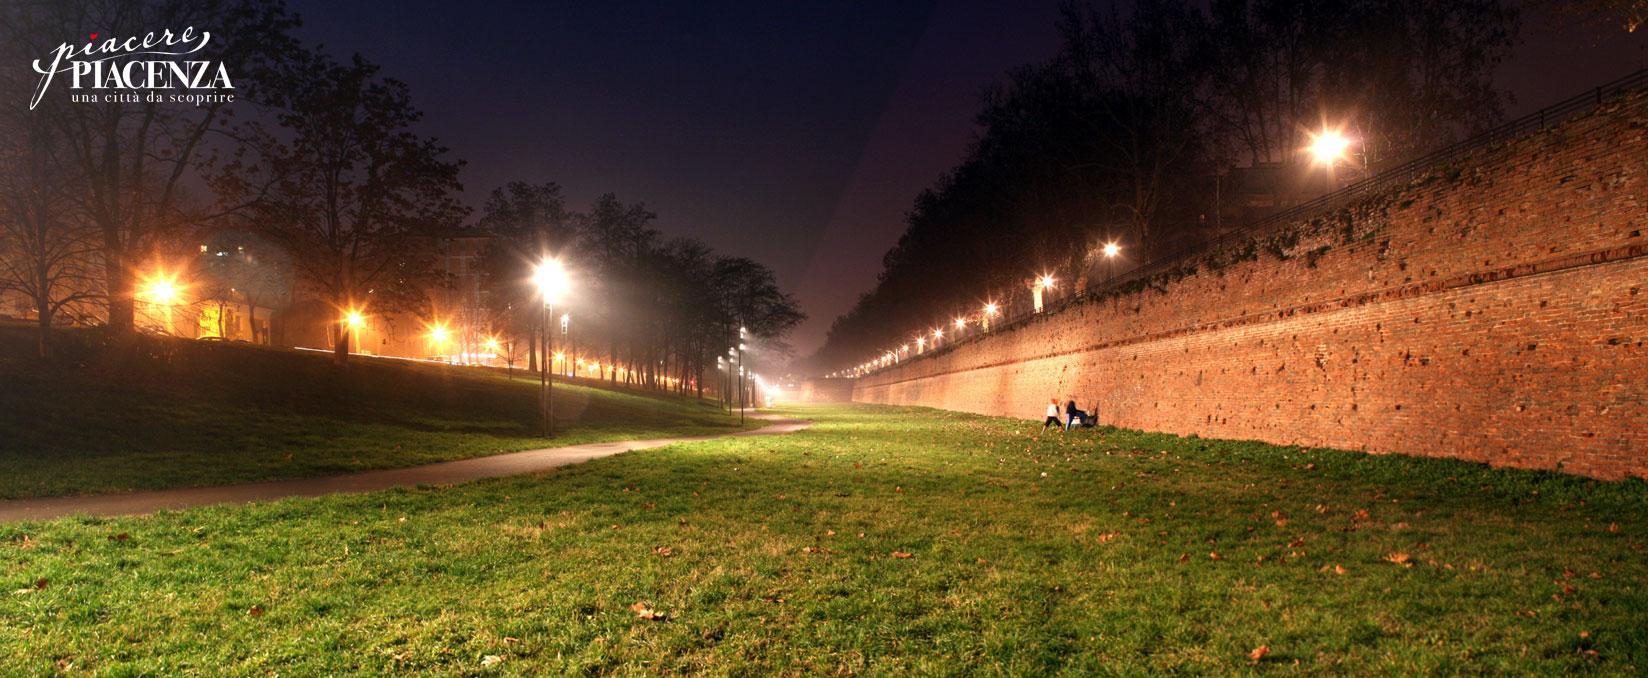 Mura Farnesiane, Piacenza   Ph. Comune di Piacenza